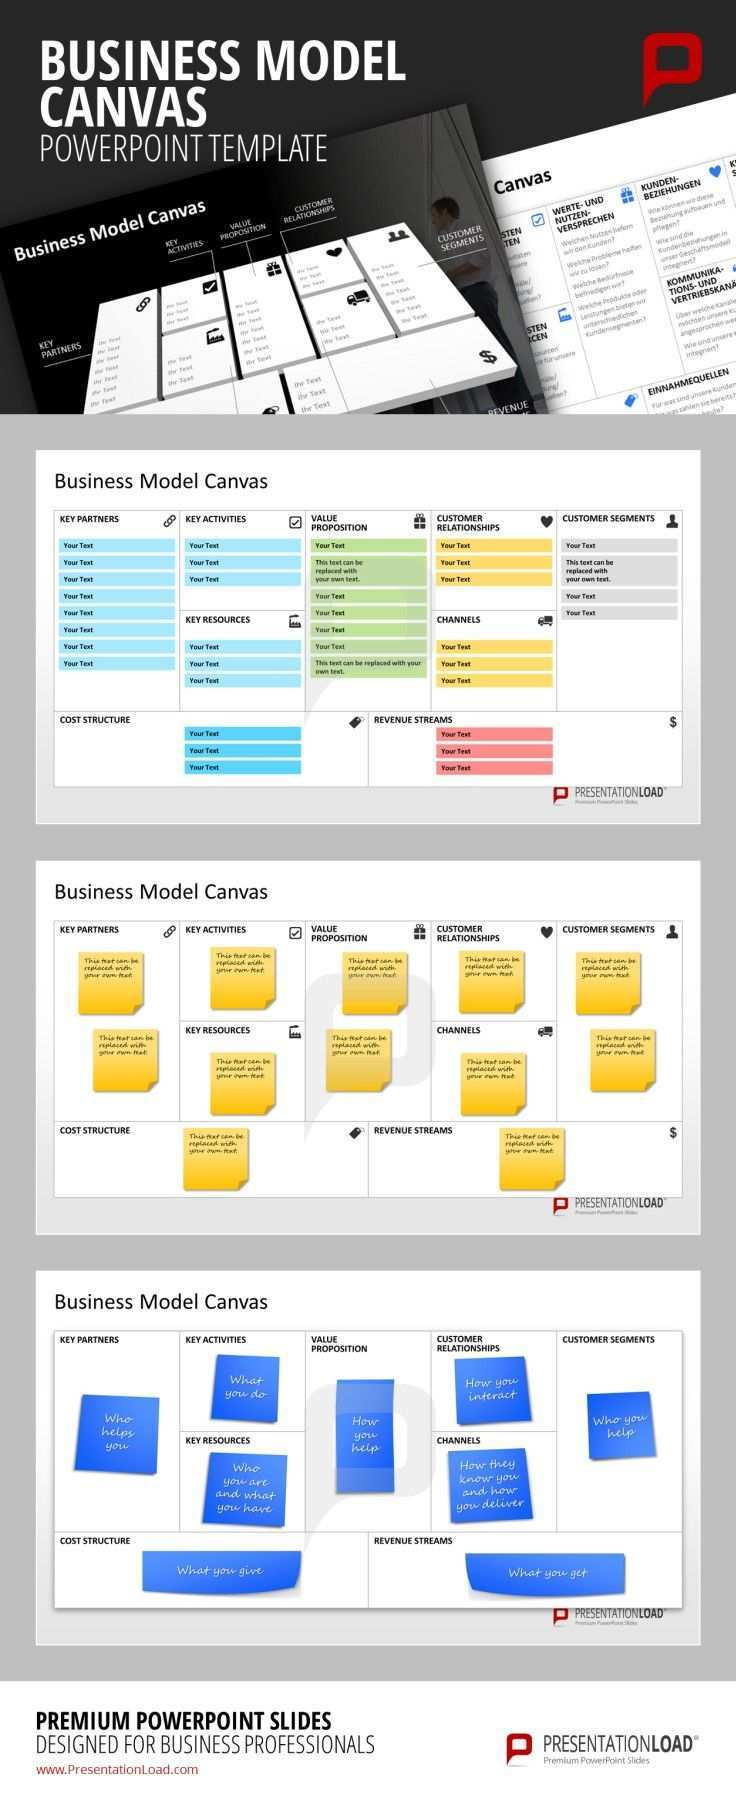 Business Model Canvas Presentationload Business Model Canvas Business Development Plan How To Plan